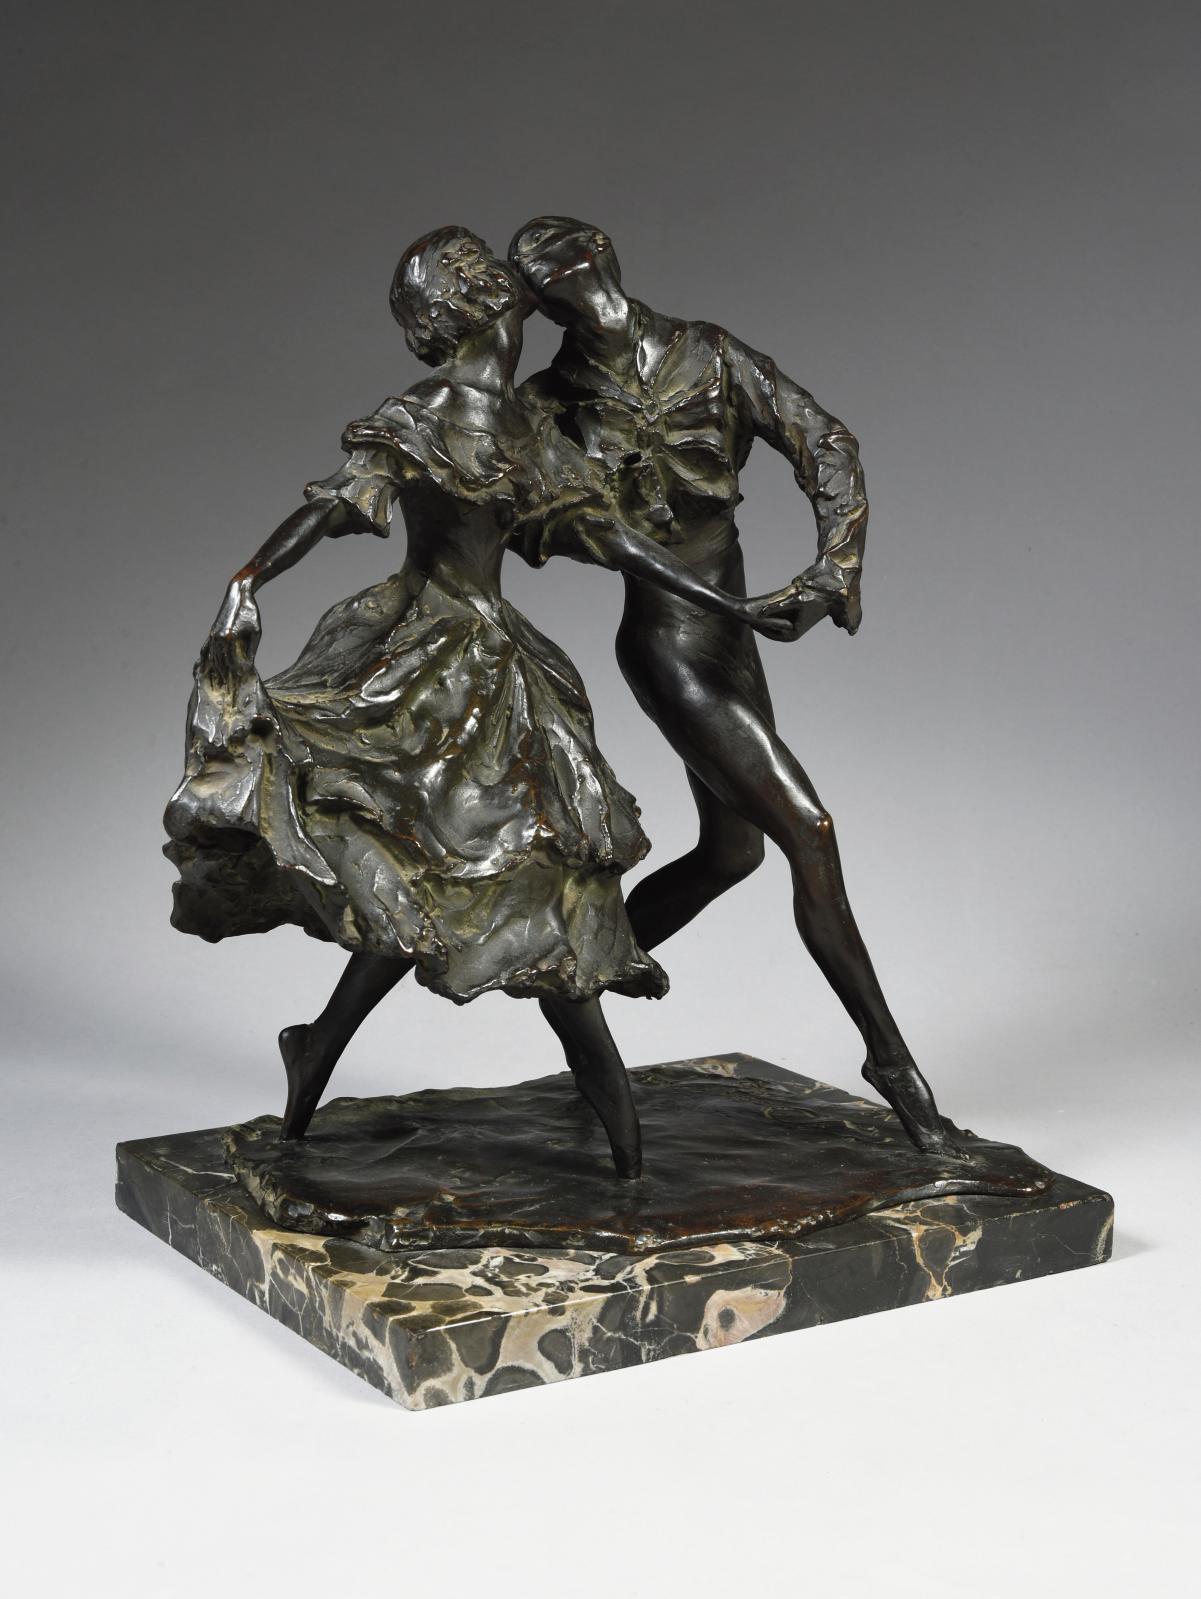 "Gleb W. Derujinsky (1888-1975), Vaslav Nijinsky and Tamara Karsavina as Harlequin and Columbine in the ballet ""Carnaval"" performed in Pari"